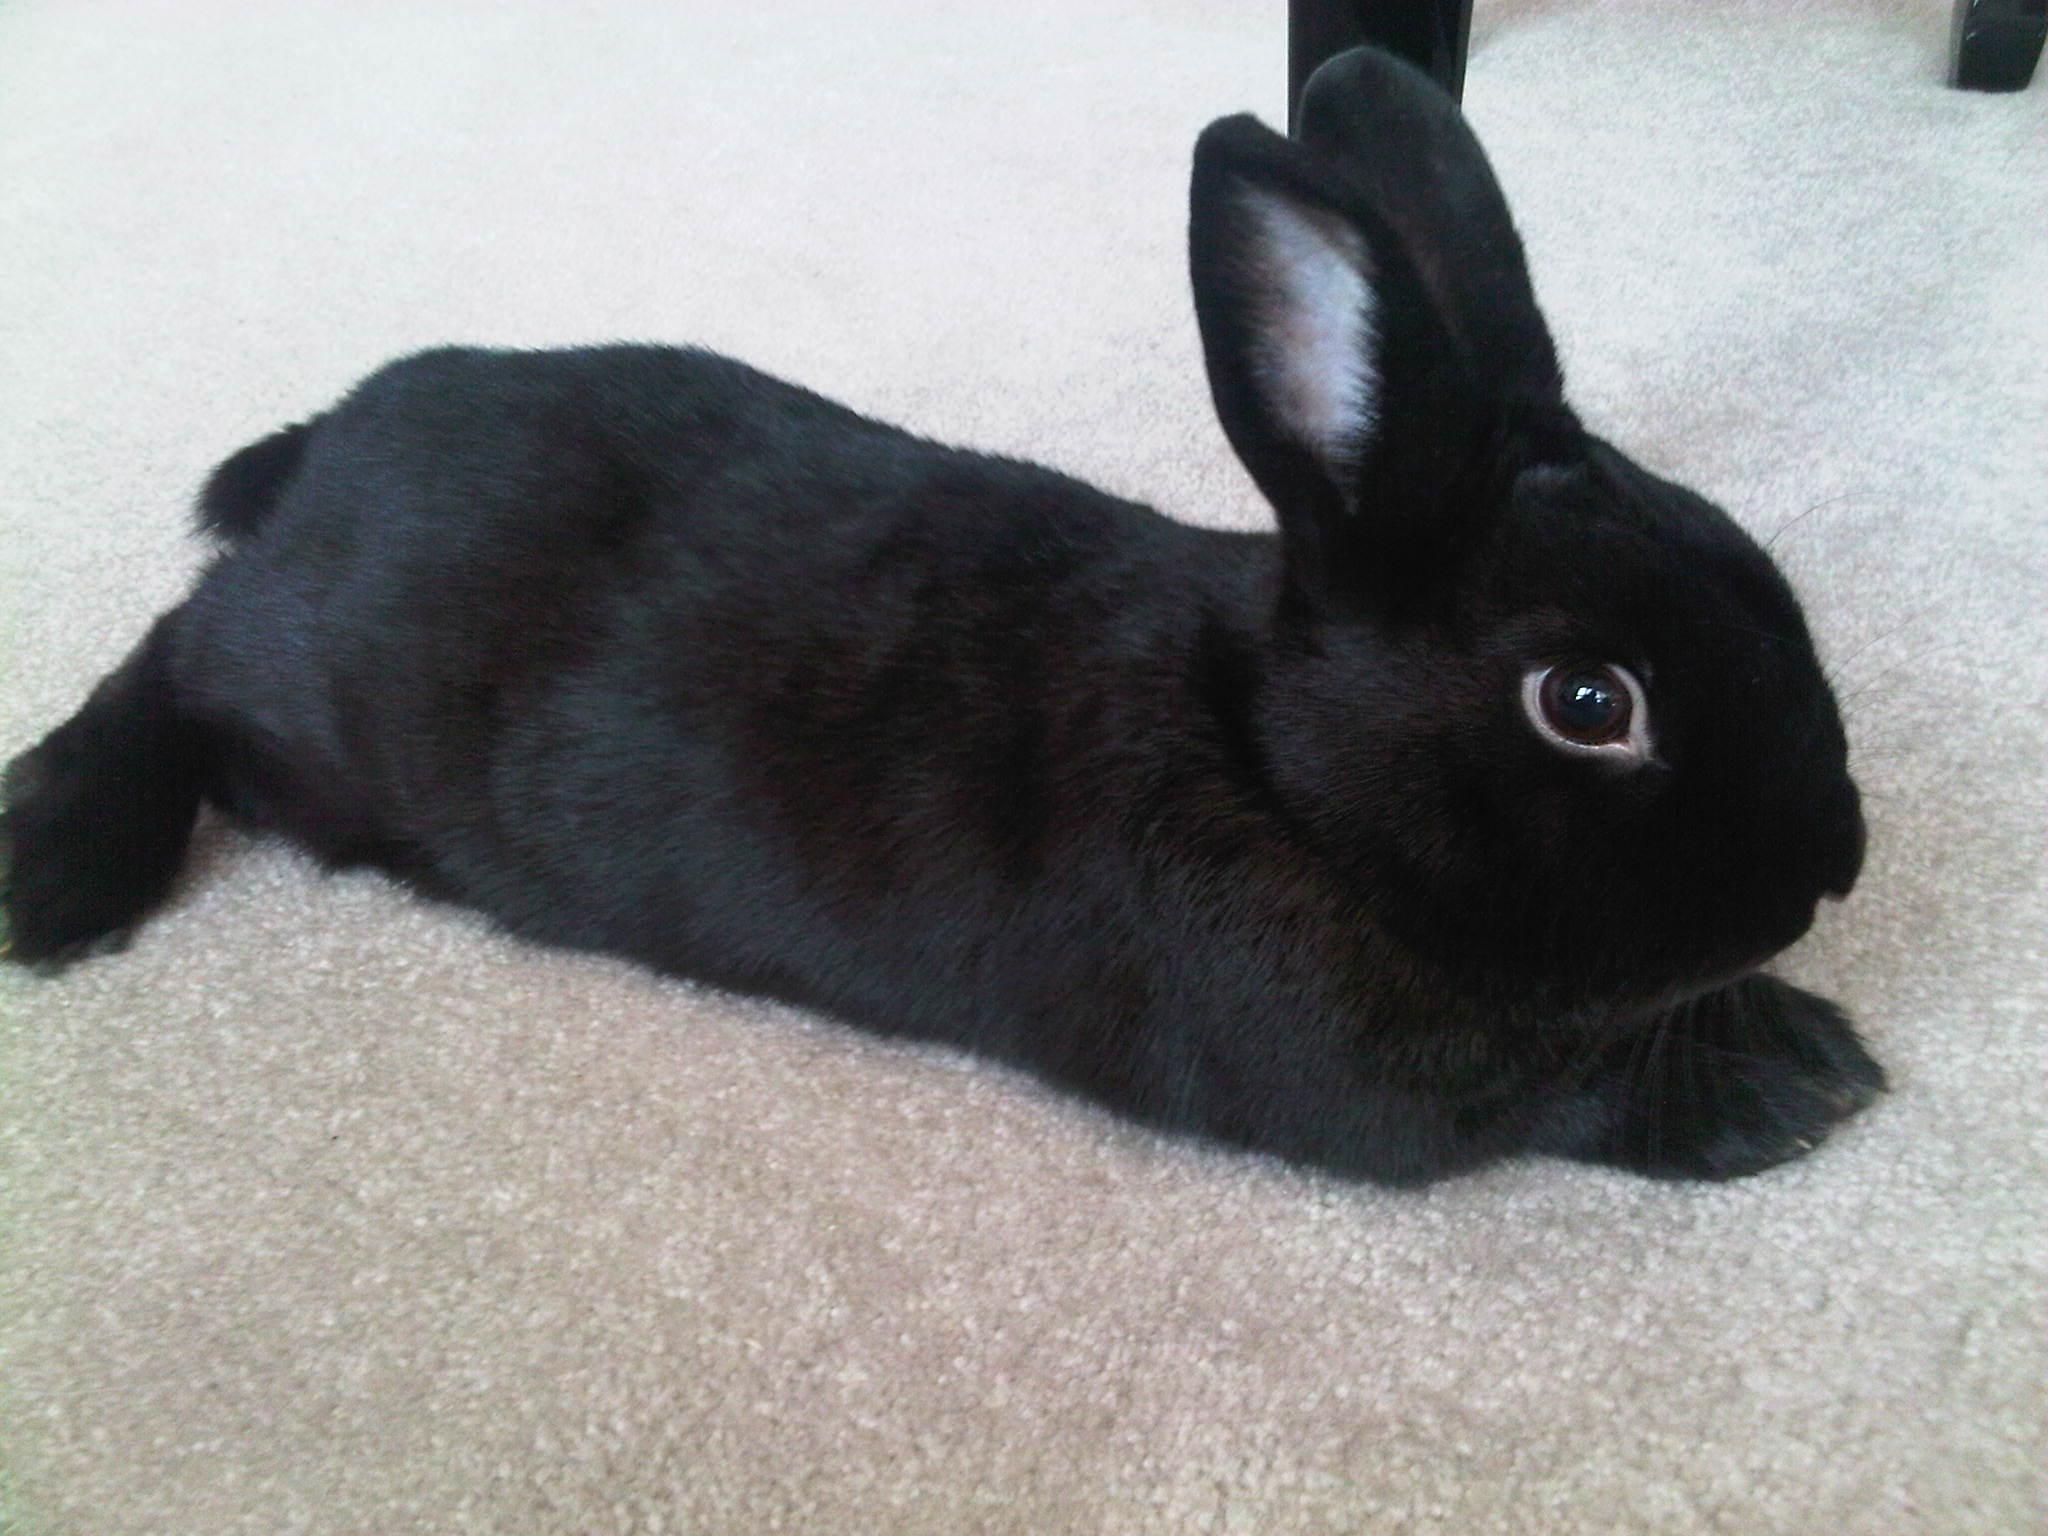 Black rabbit #3